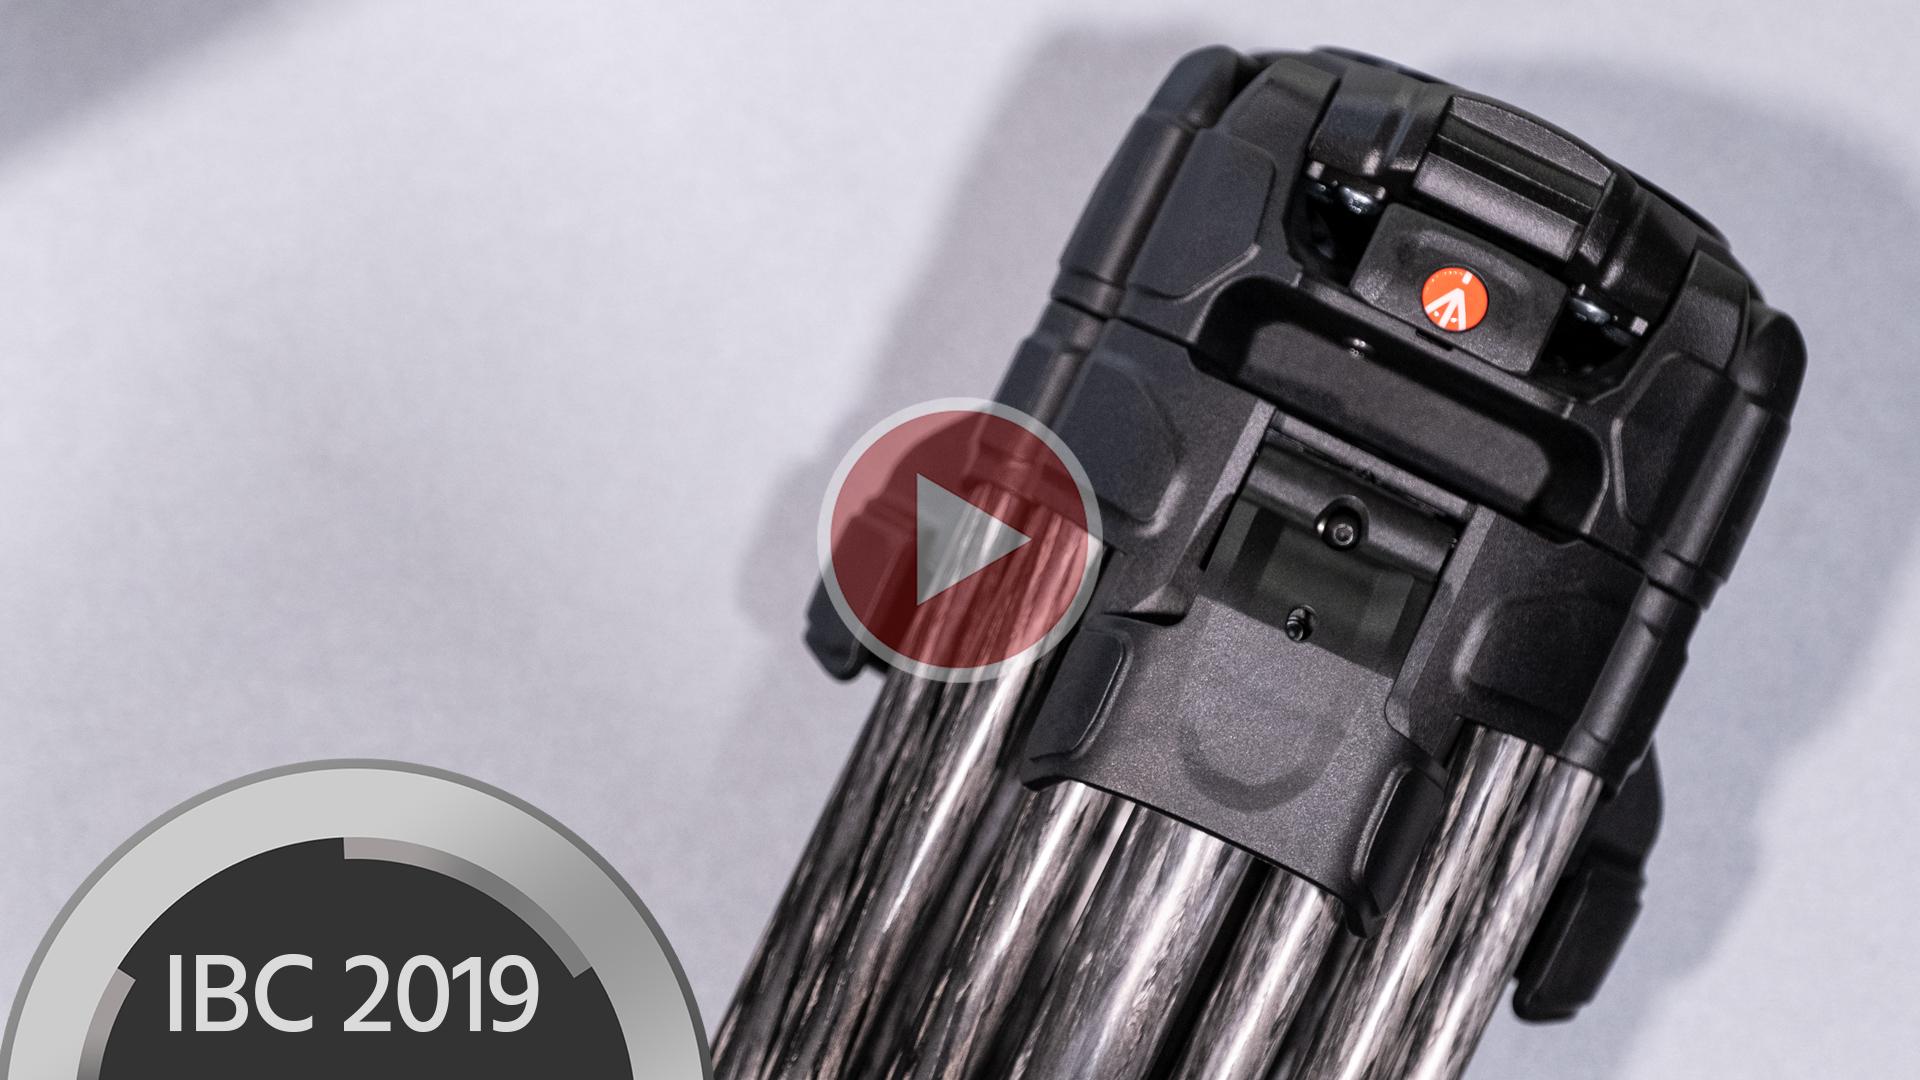 Trípode de doble pata Manfrotto 645 FTT de fibra de carbono con patas de despliegue rápido